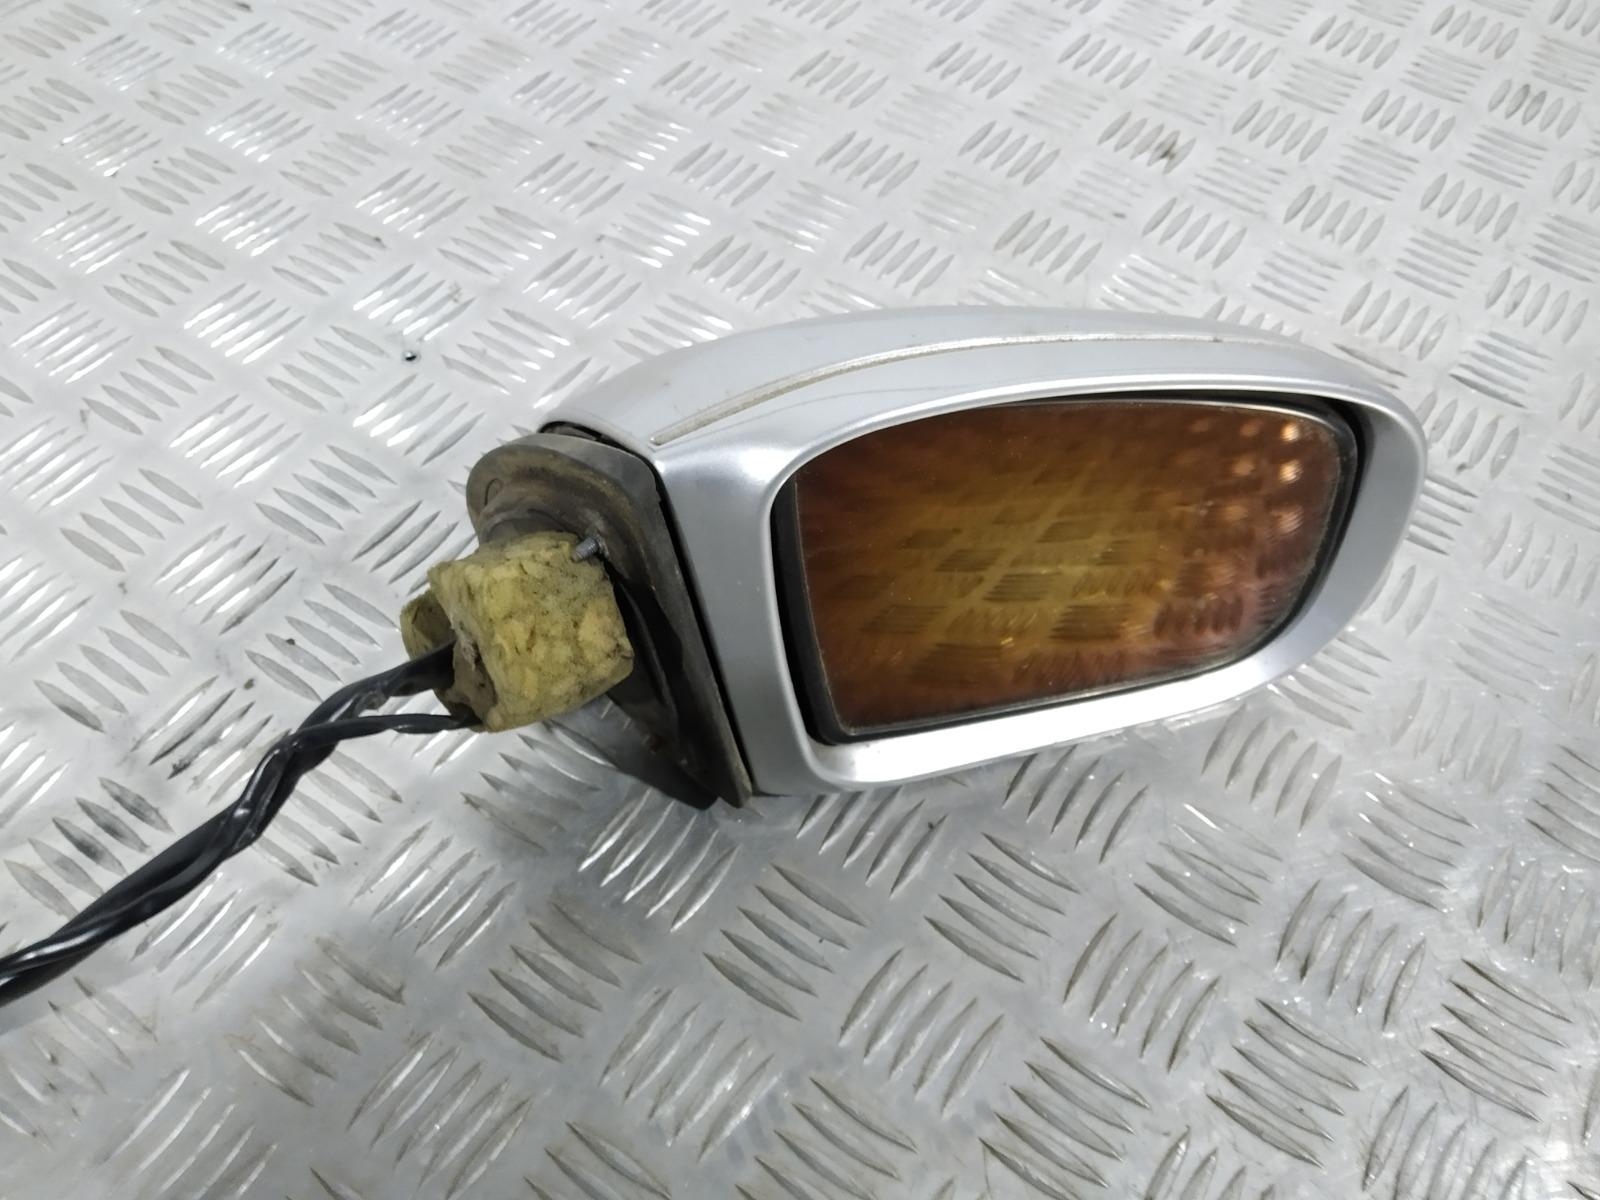 Зеркало наружное правое Mercedes S W220 3.7 I 2003 (б/у)